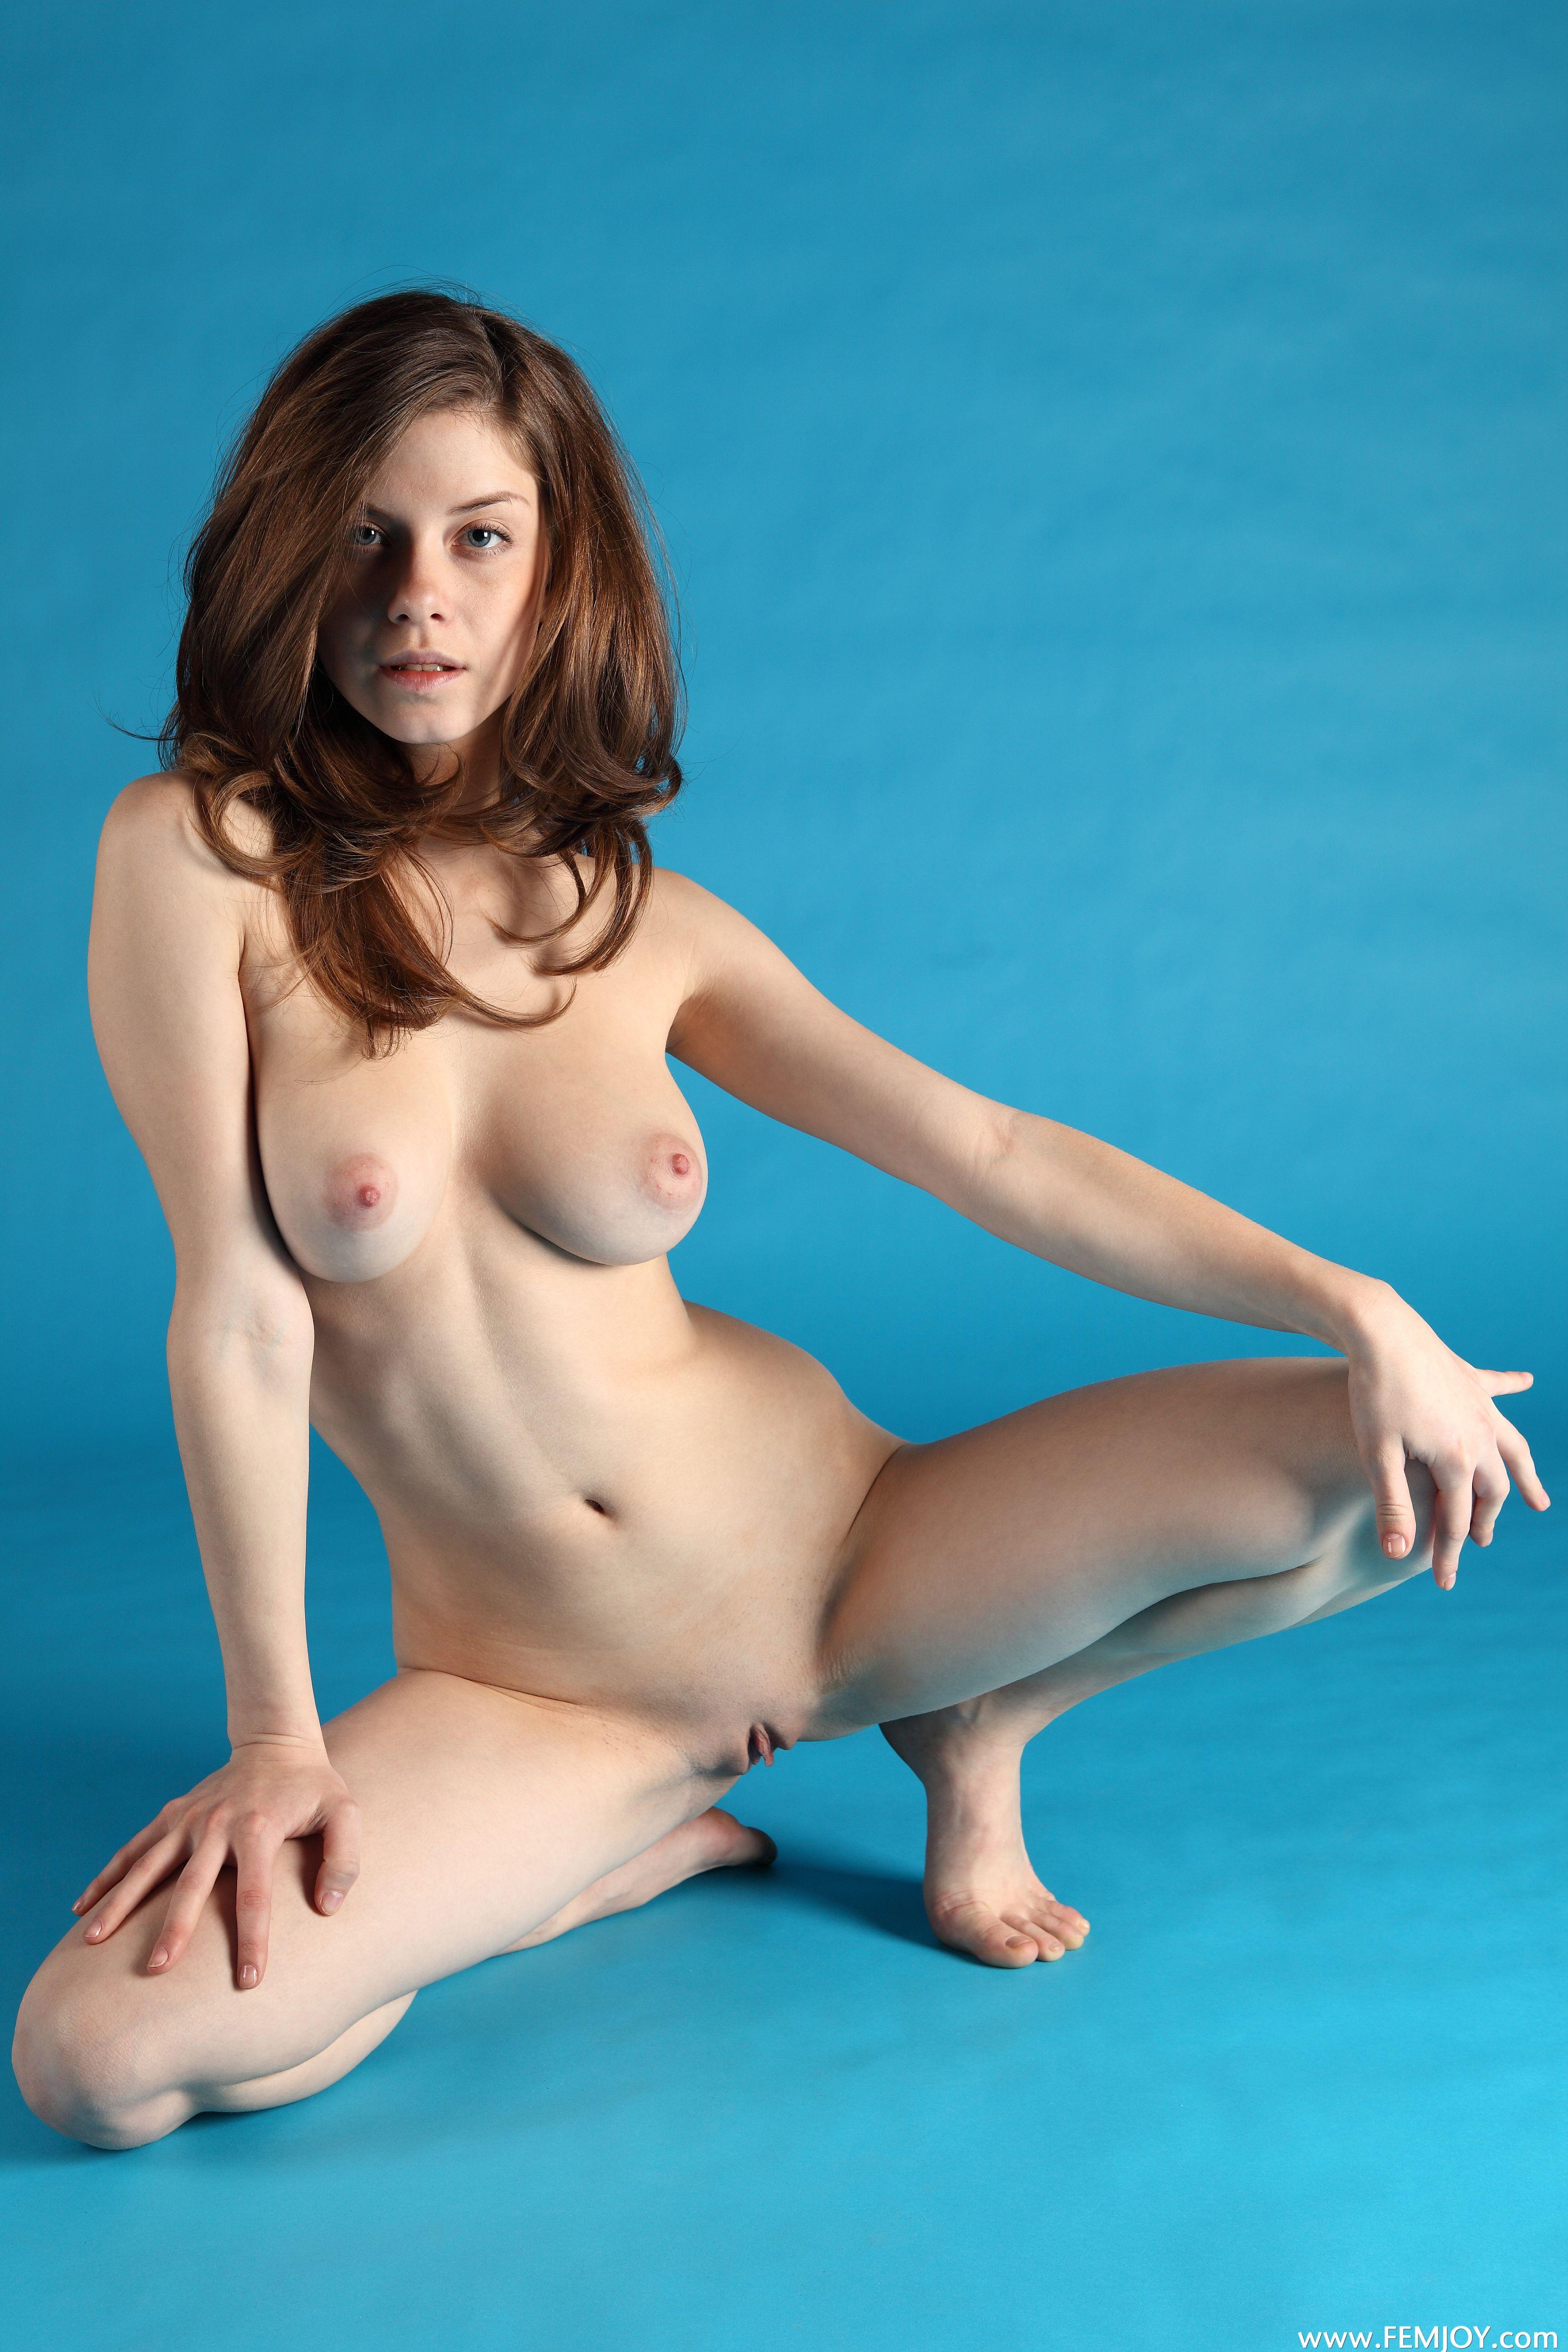 turboimagehost.com imagesize:960x1440ls porn 5